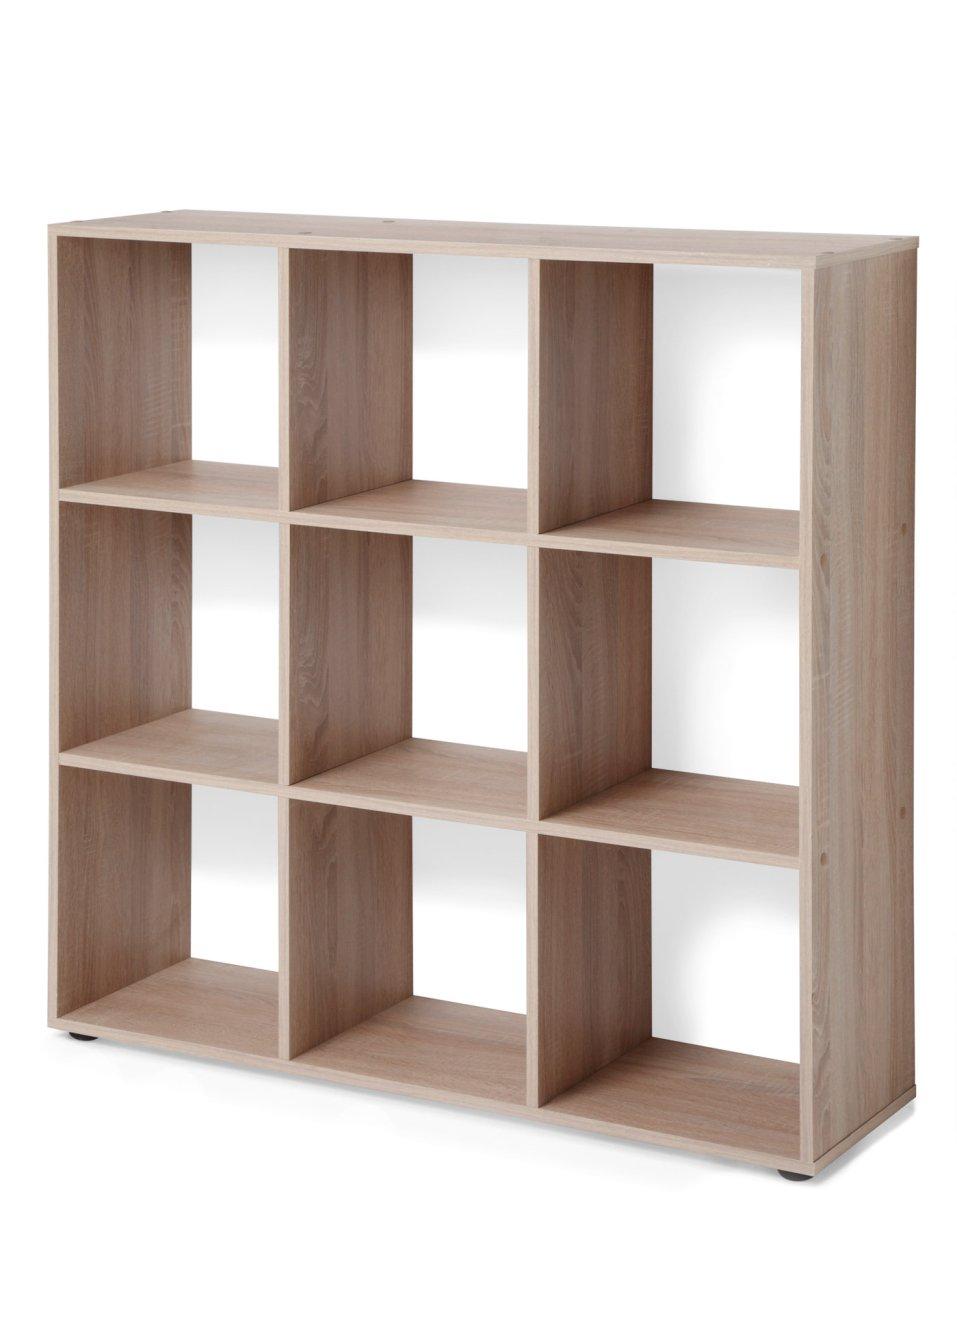 regal kuba 9 f cher mit 9 f chern wei bpc living. Black Bedroom Furniture Sets. Home Design Ideas